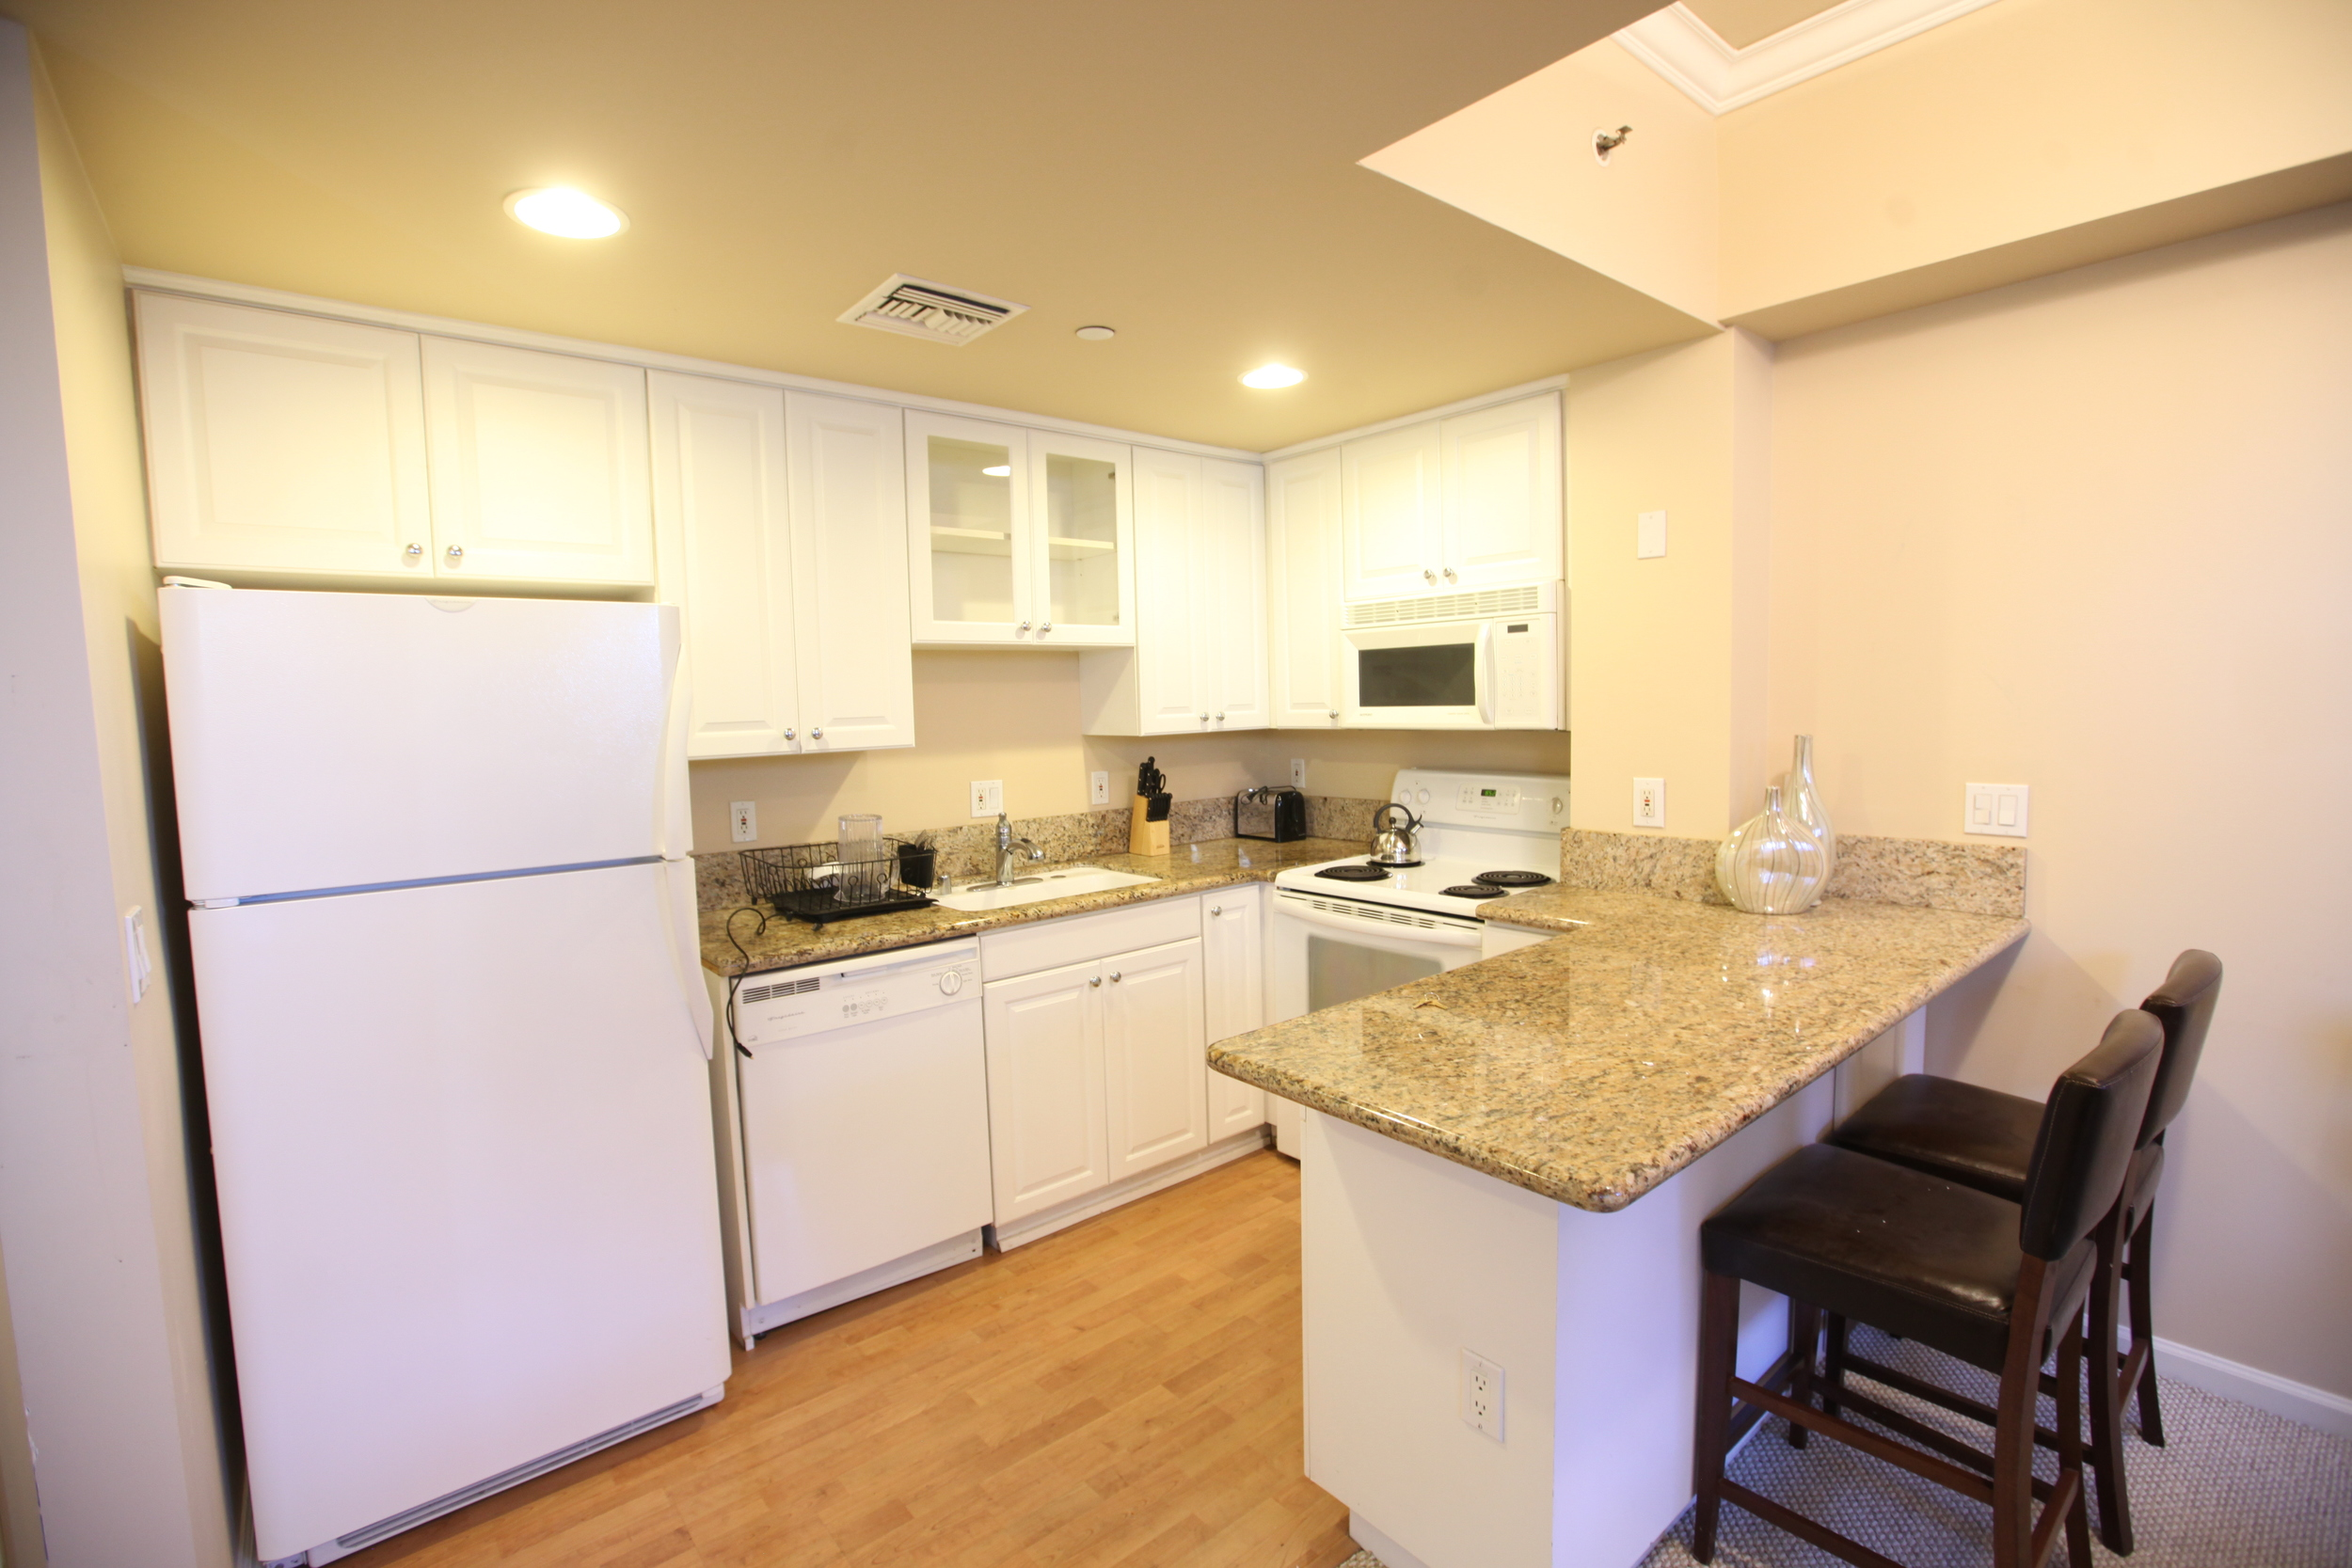 Unit 320 Kitchen